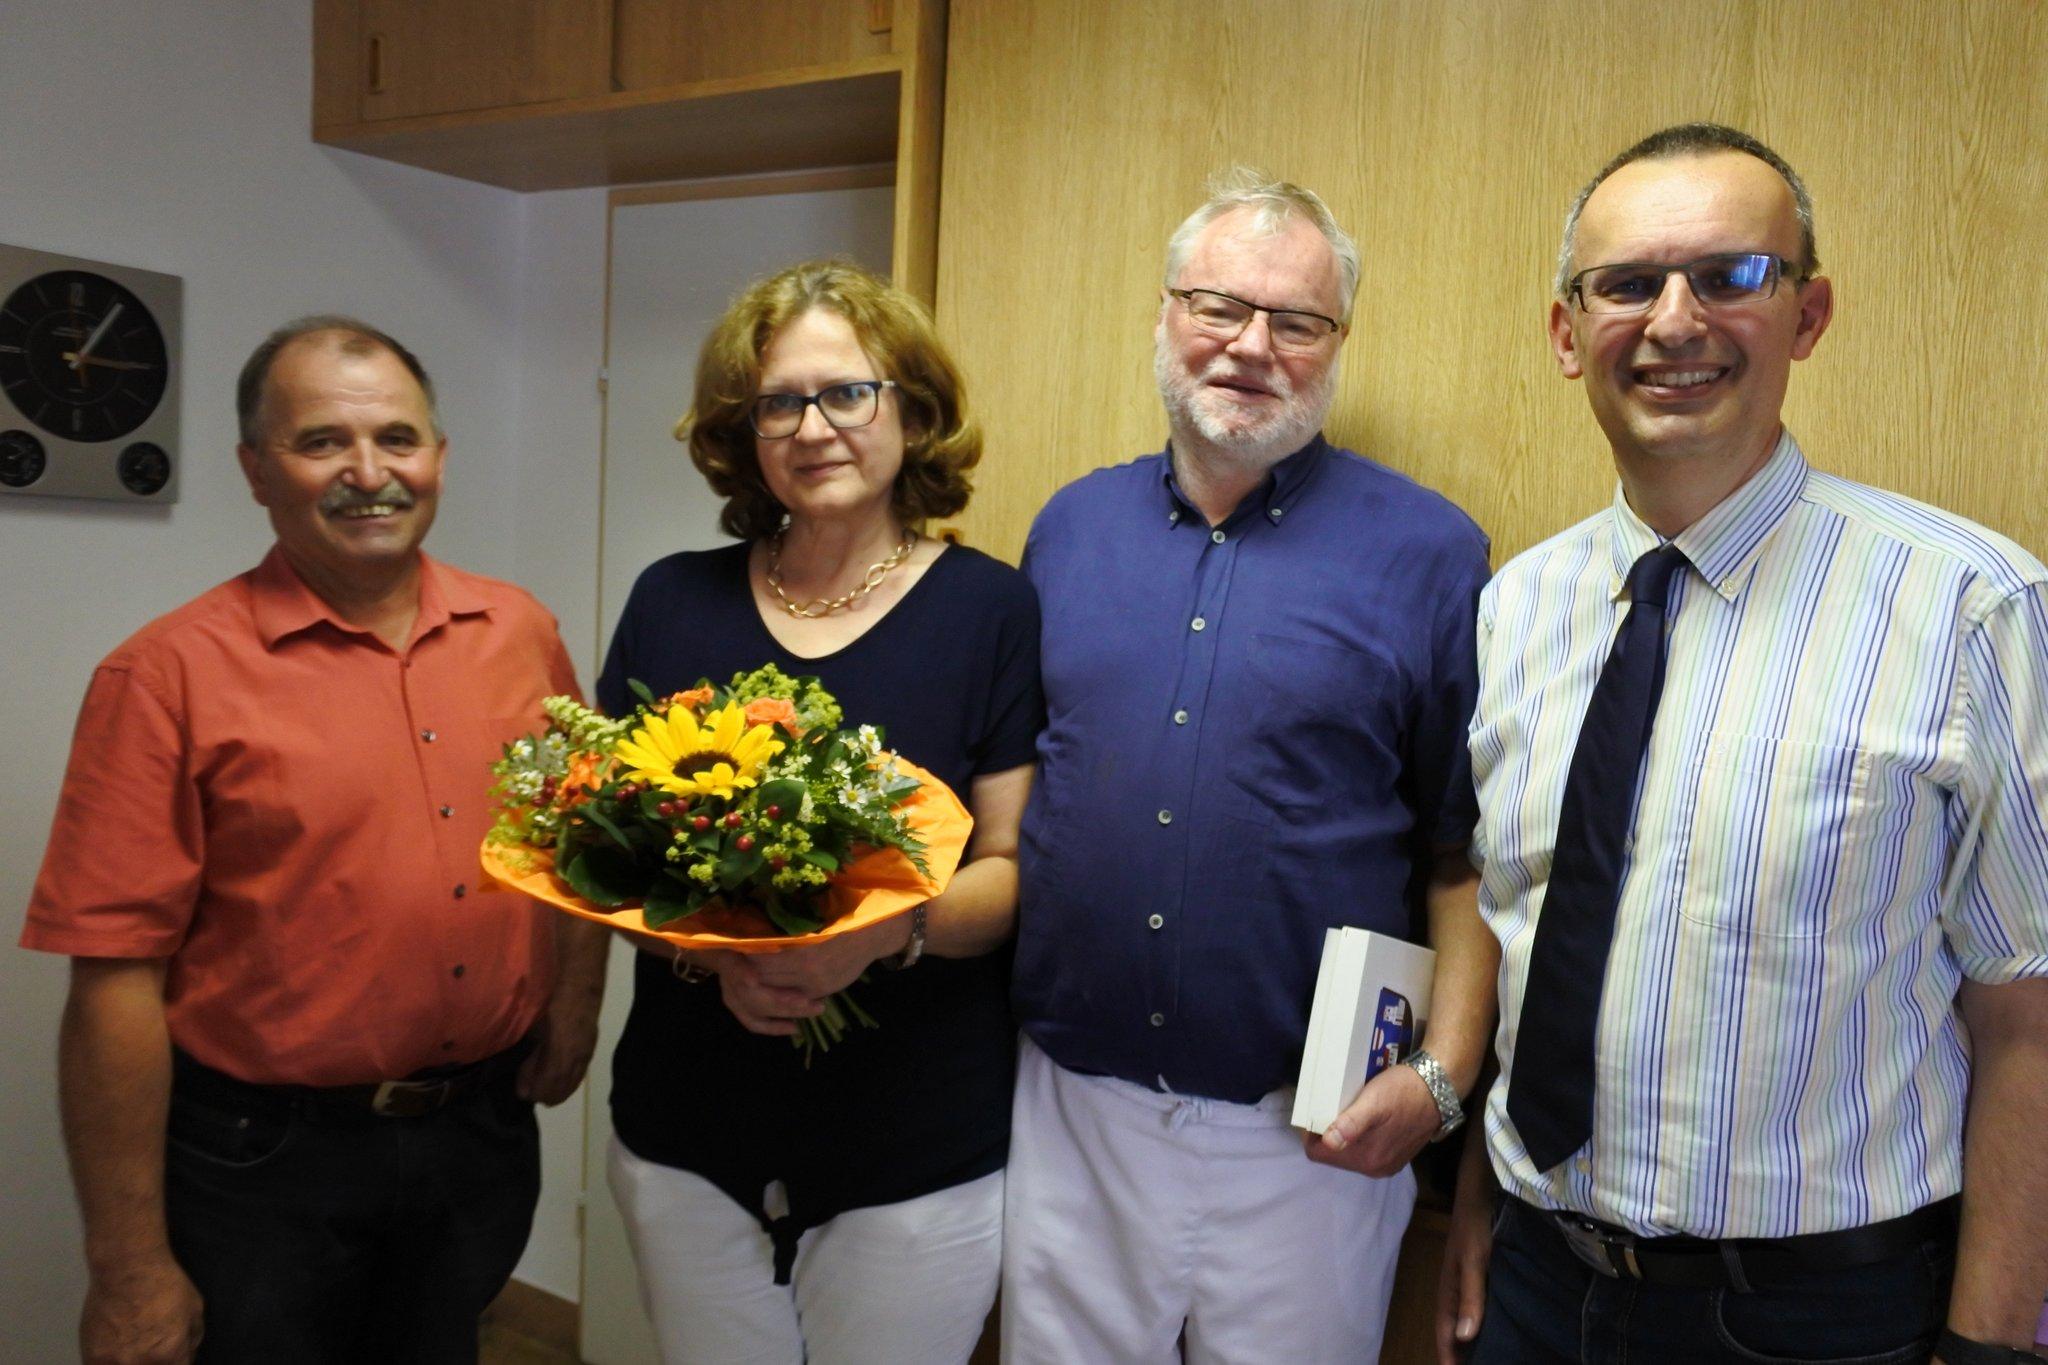 Gro-siegharts dating kostenlos - Singletreff ab 50 pettenbach